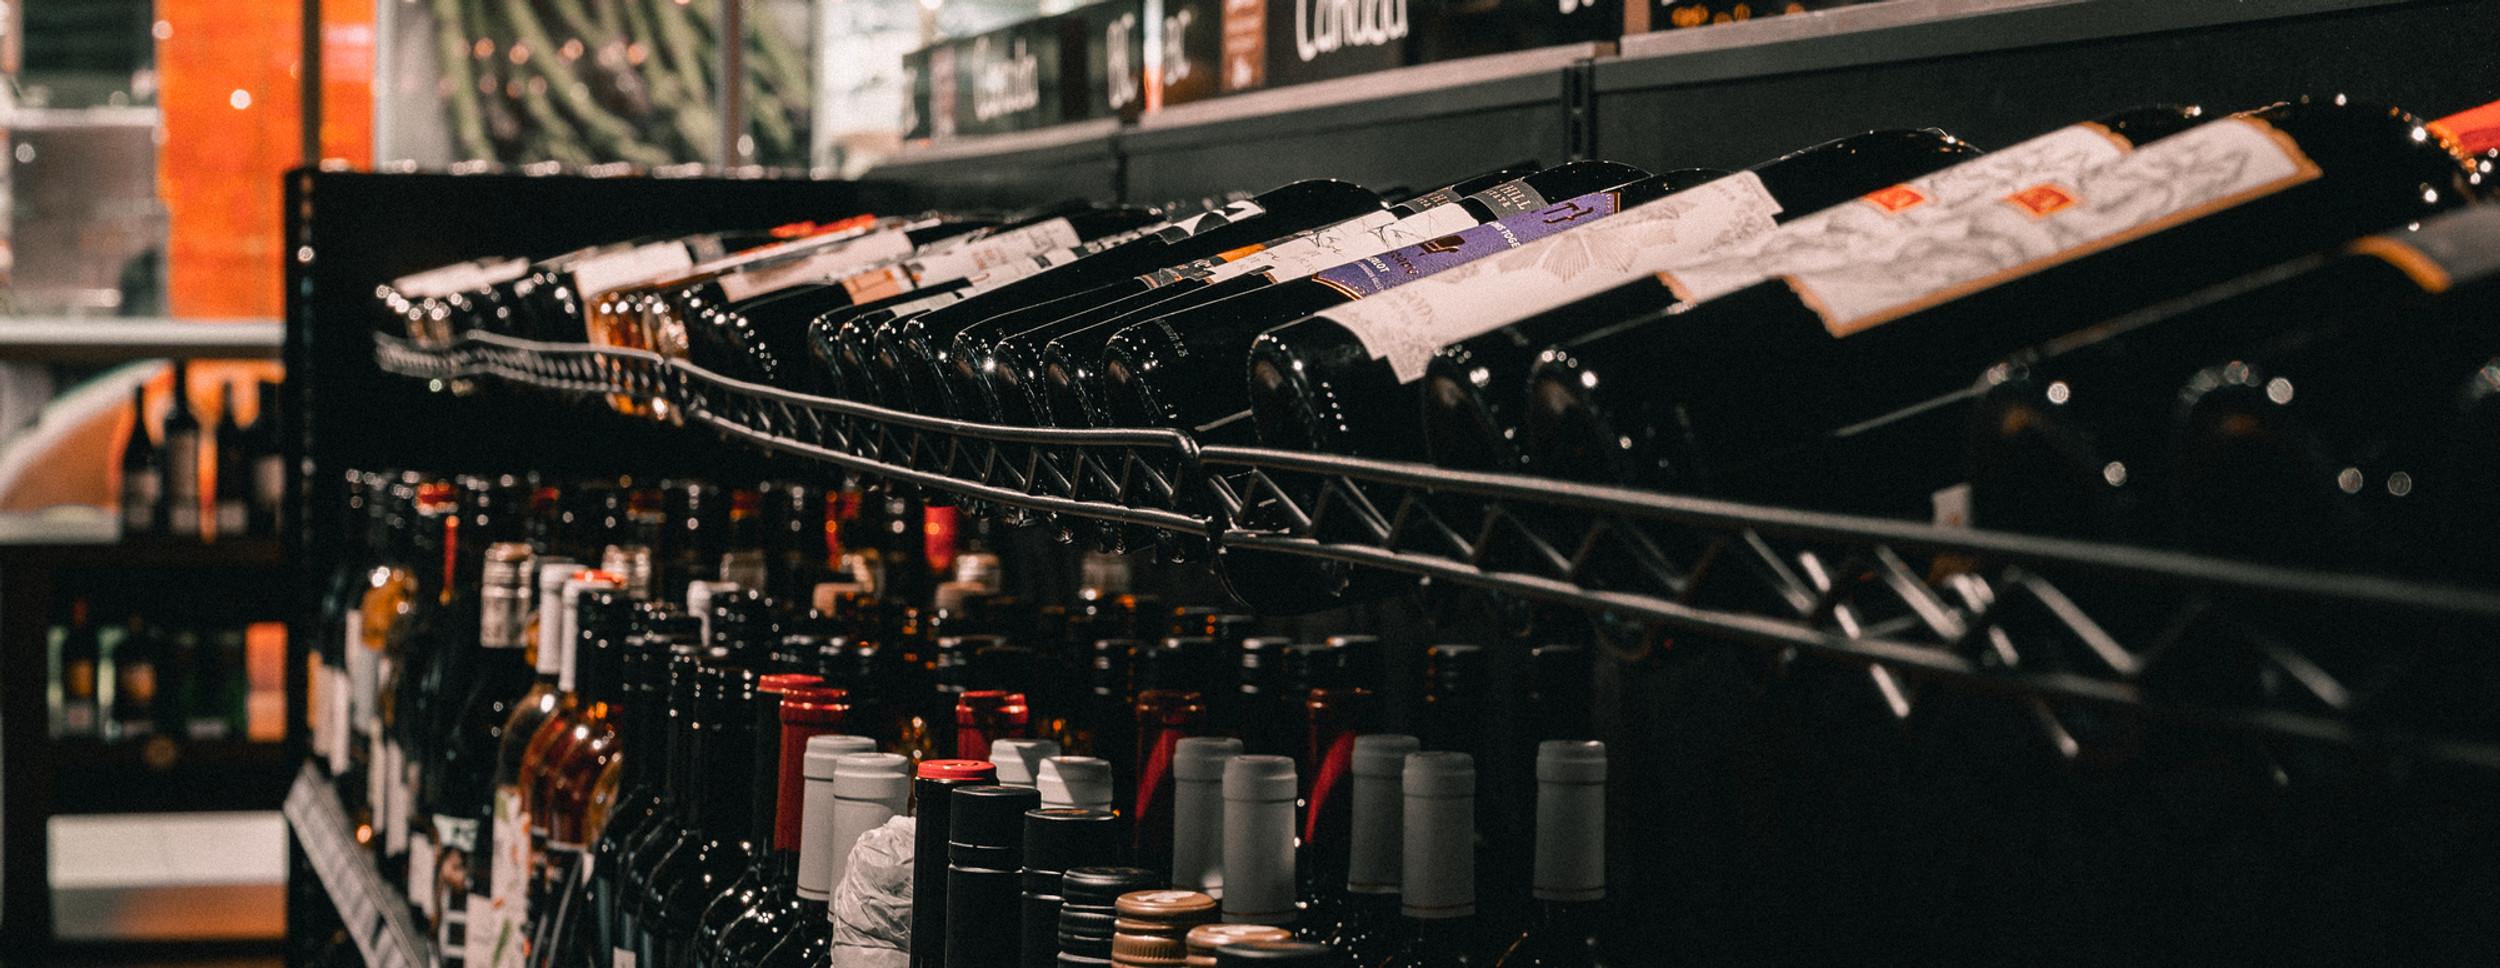 distilledliquor_websitephoto (19 of 27).